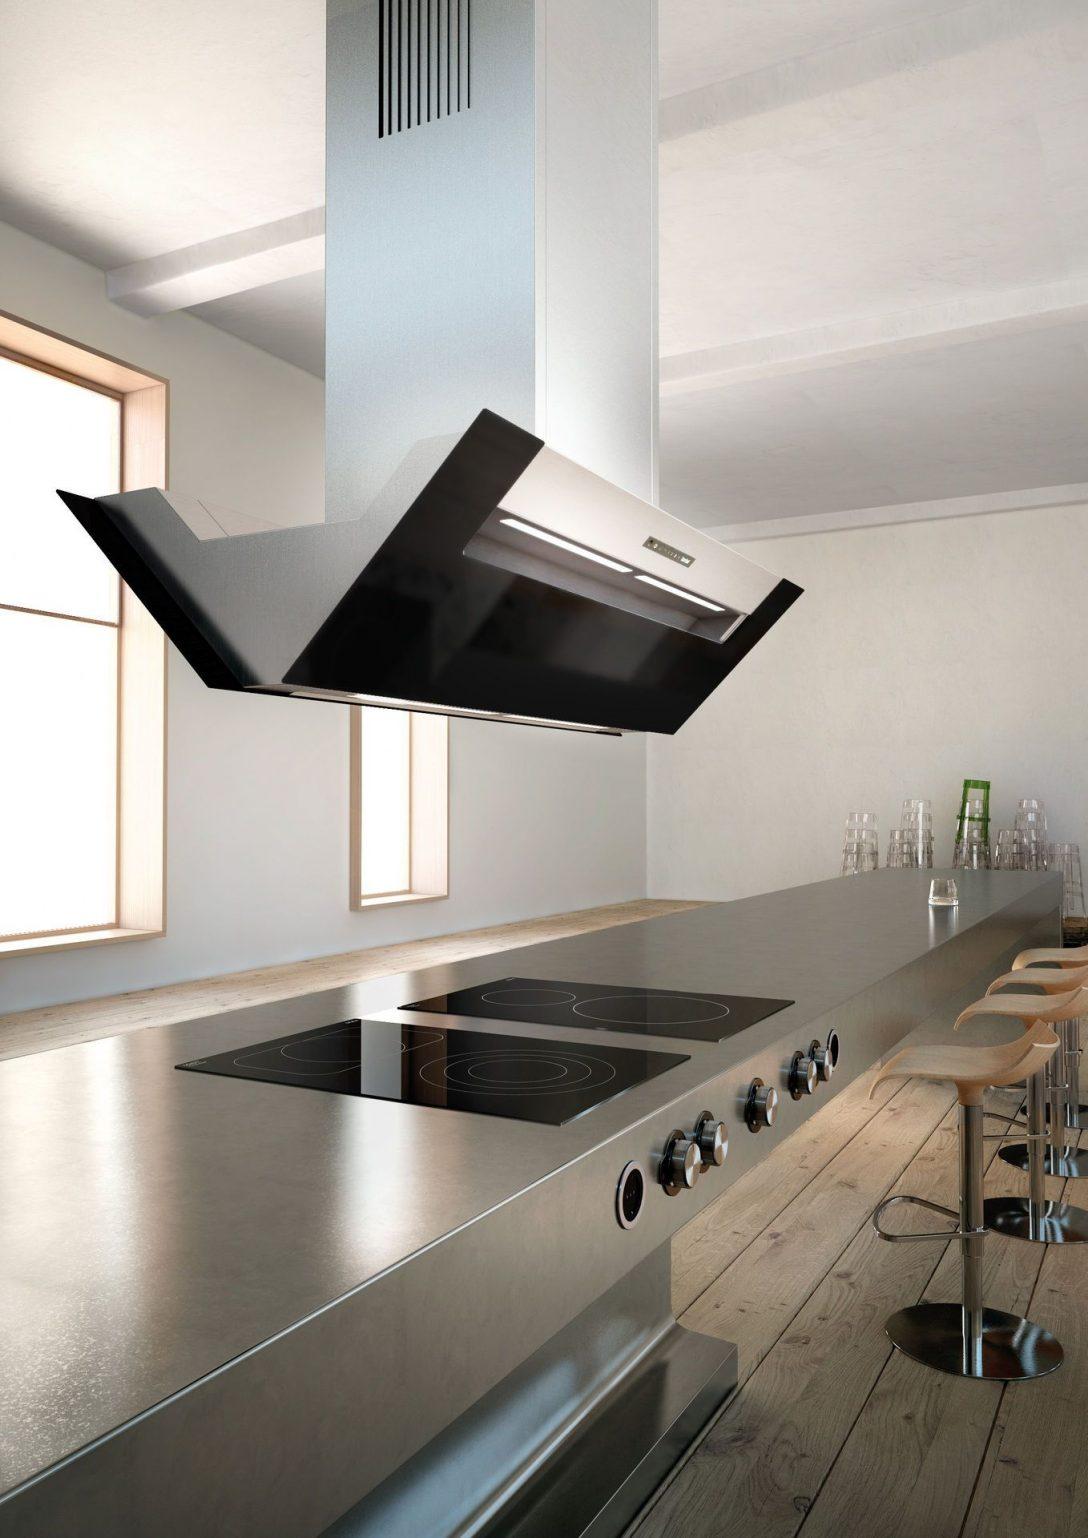 Large Size of Bosch Lüftung Küche Lüftung Küche Ohne Fenster Lüftung Küche Gastronomie Dichtheitsklasse Lüftung Küche Küche Lüftung Küche